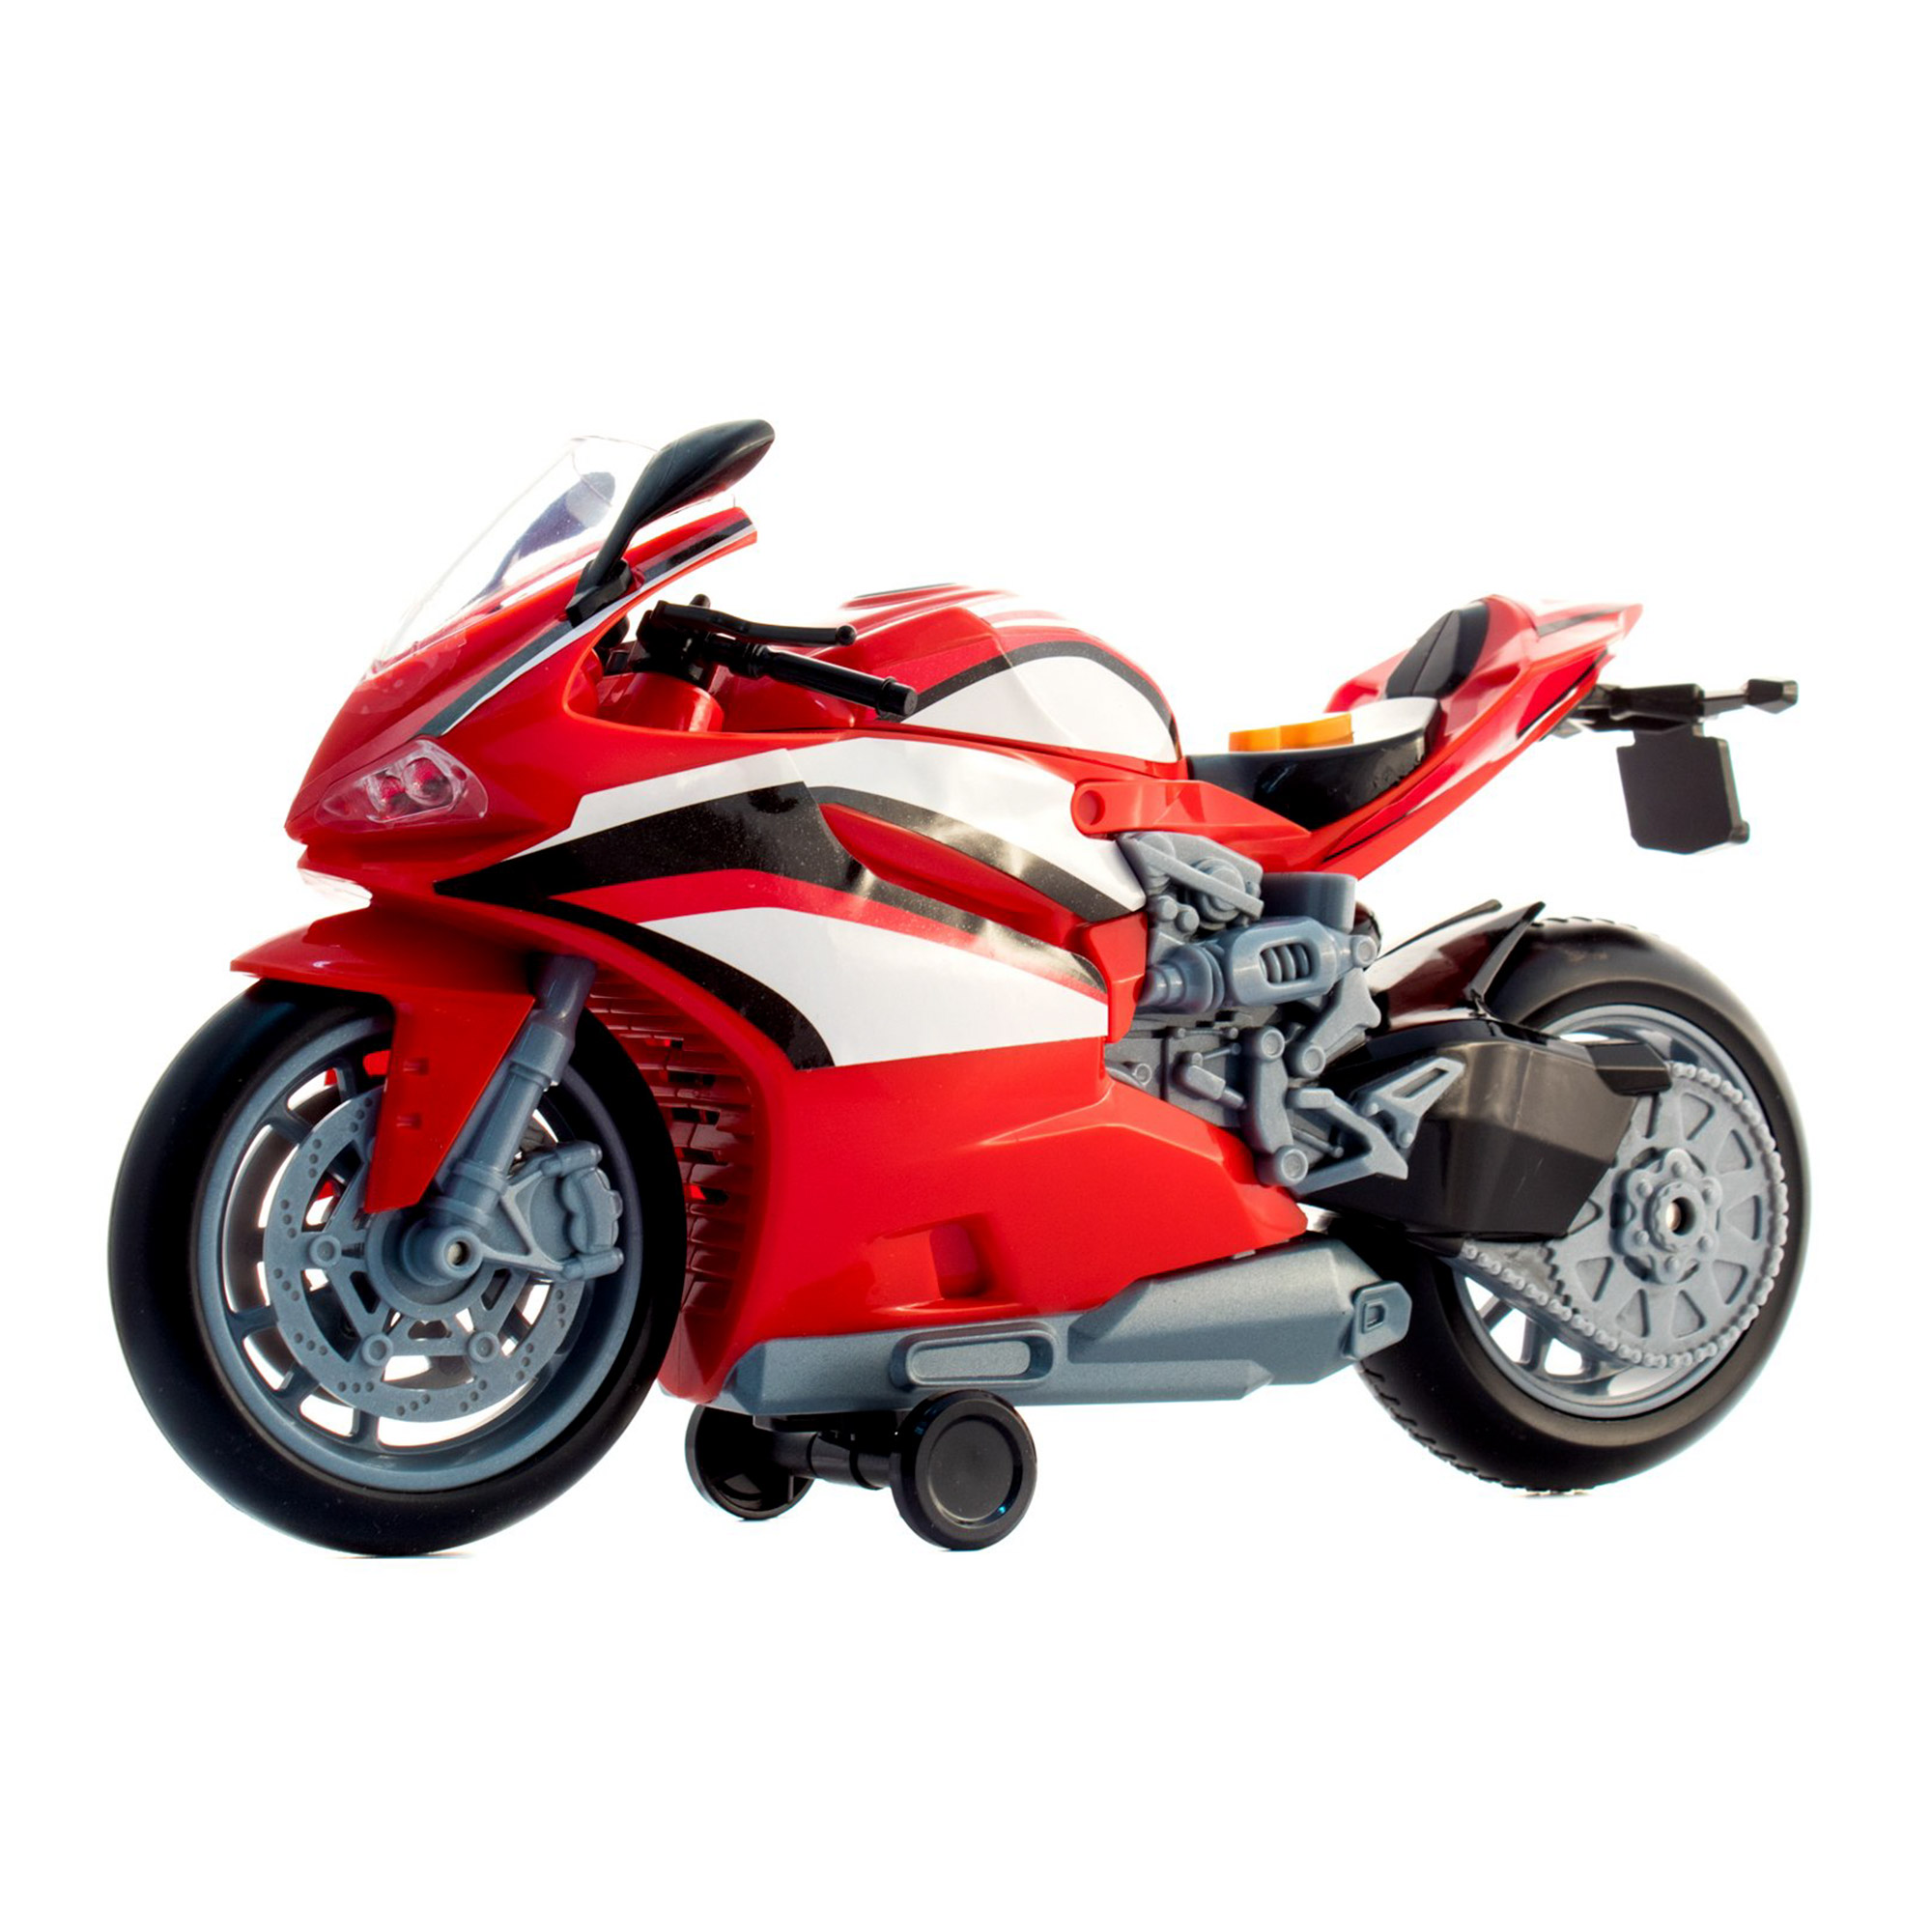 Фото - Мотоцикл HTI (Teamsterz) Street Starz Красный трек hti teamsterz турбо прыжок